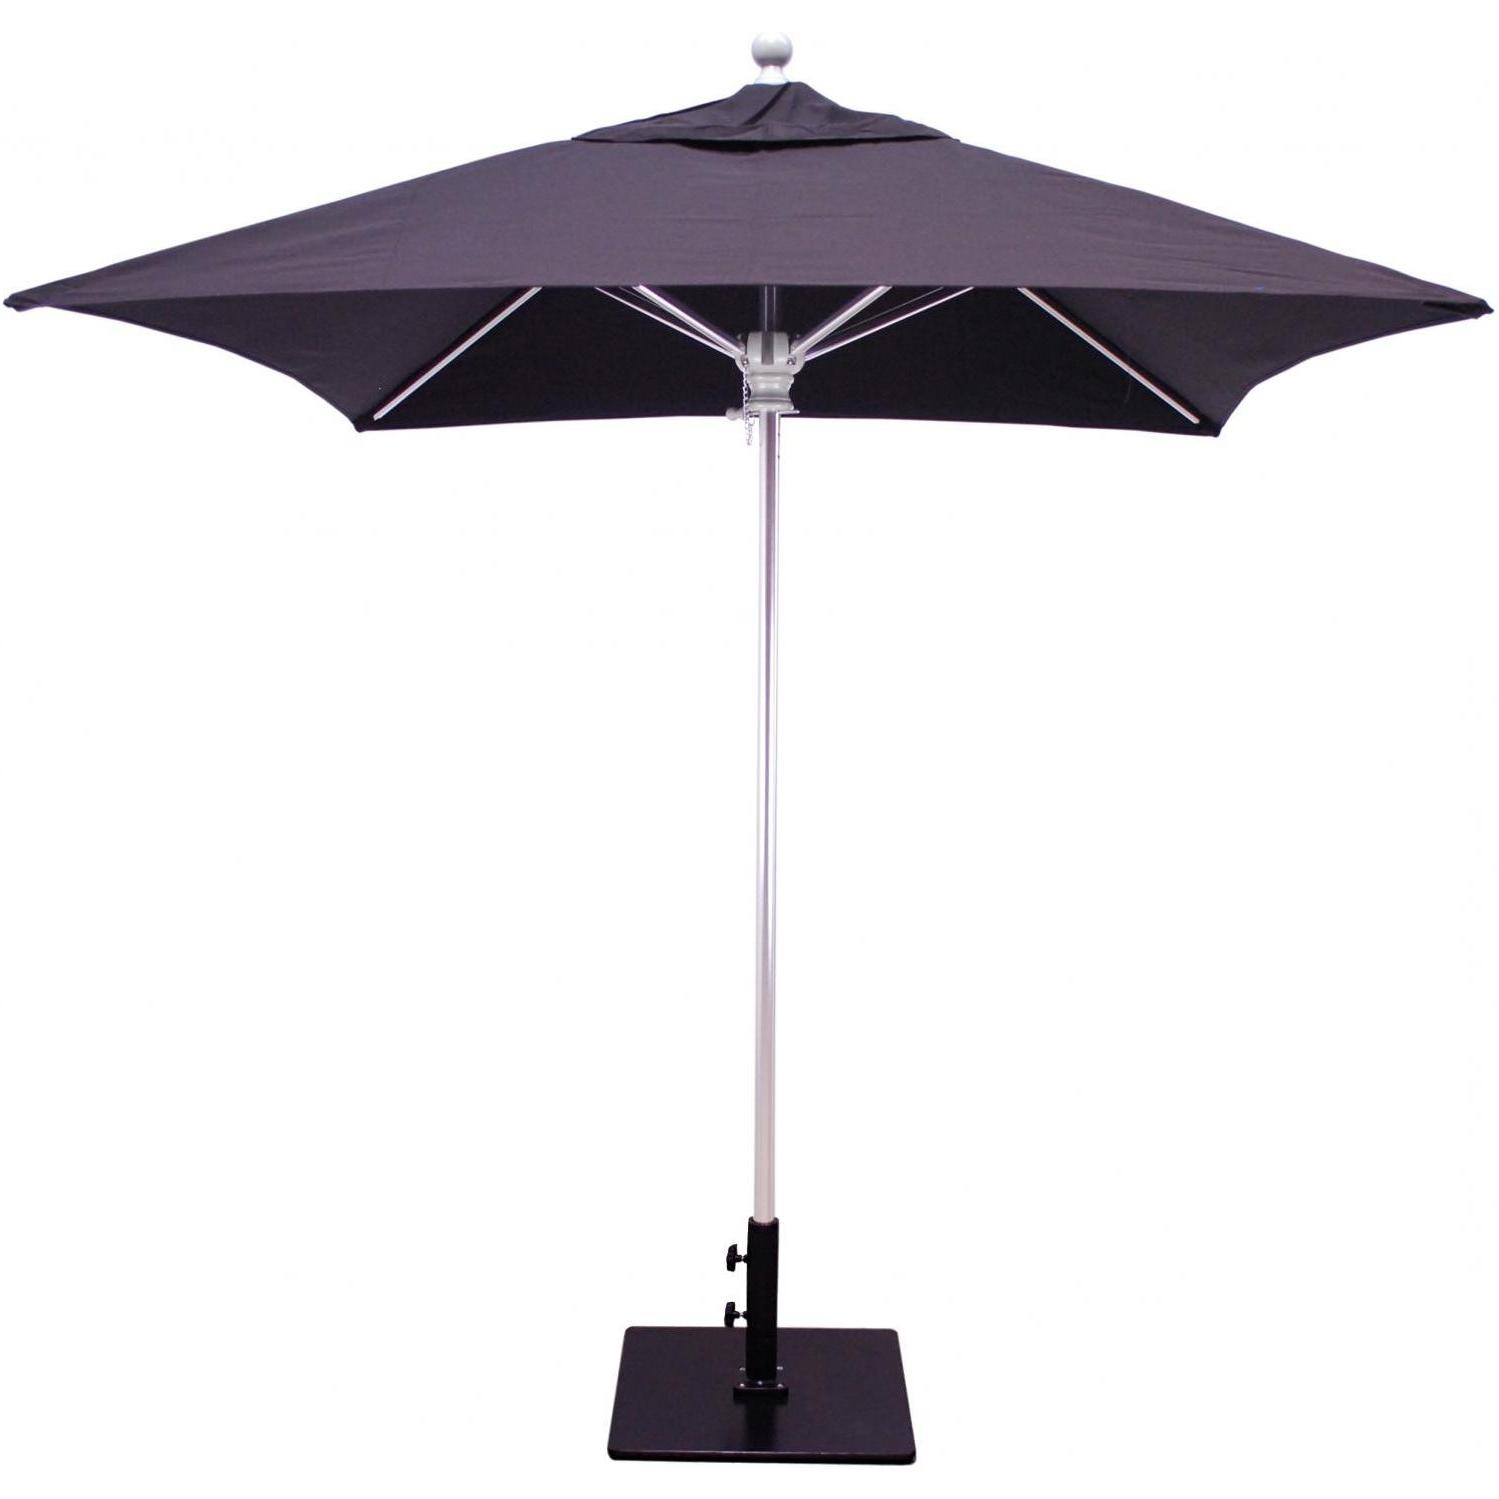 Square Patio Umbrellas Intended For Popular Galtech Sr Series 6 Ft Aluminum Square Commercial Patio Umbrella (View 16 of 20)